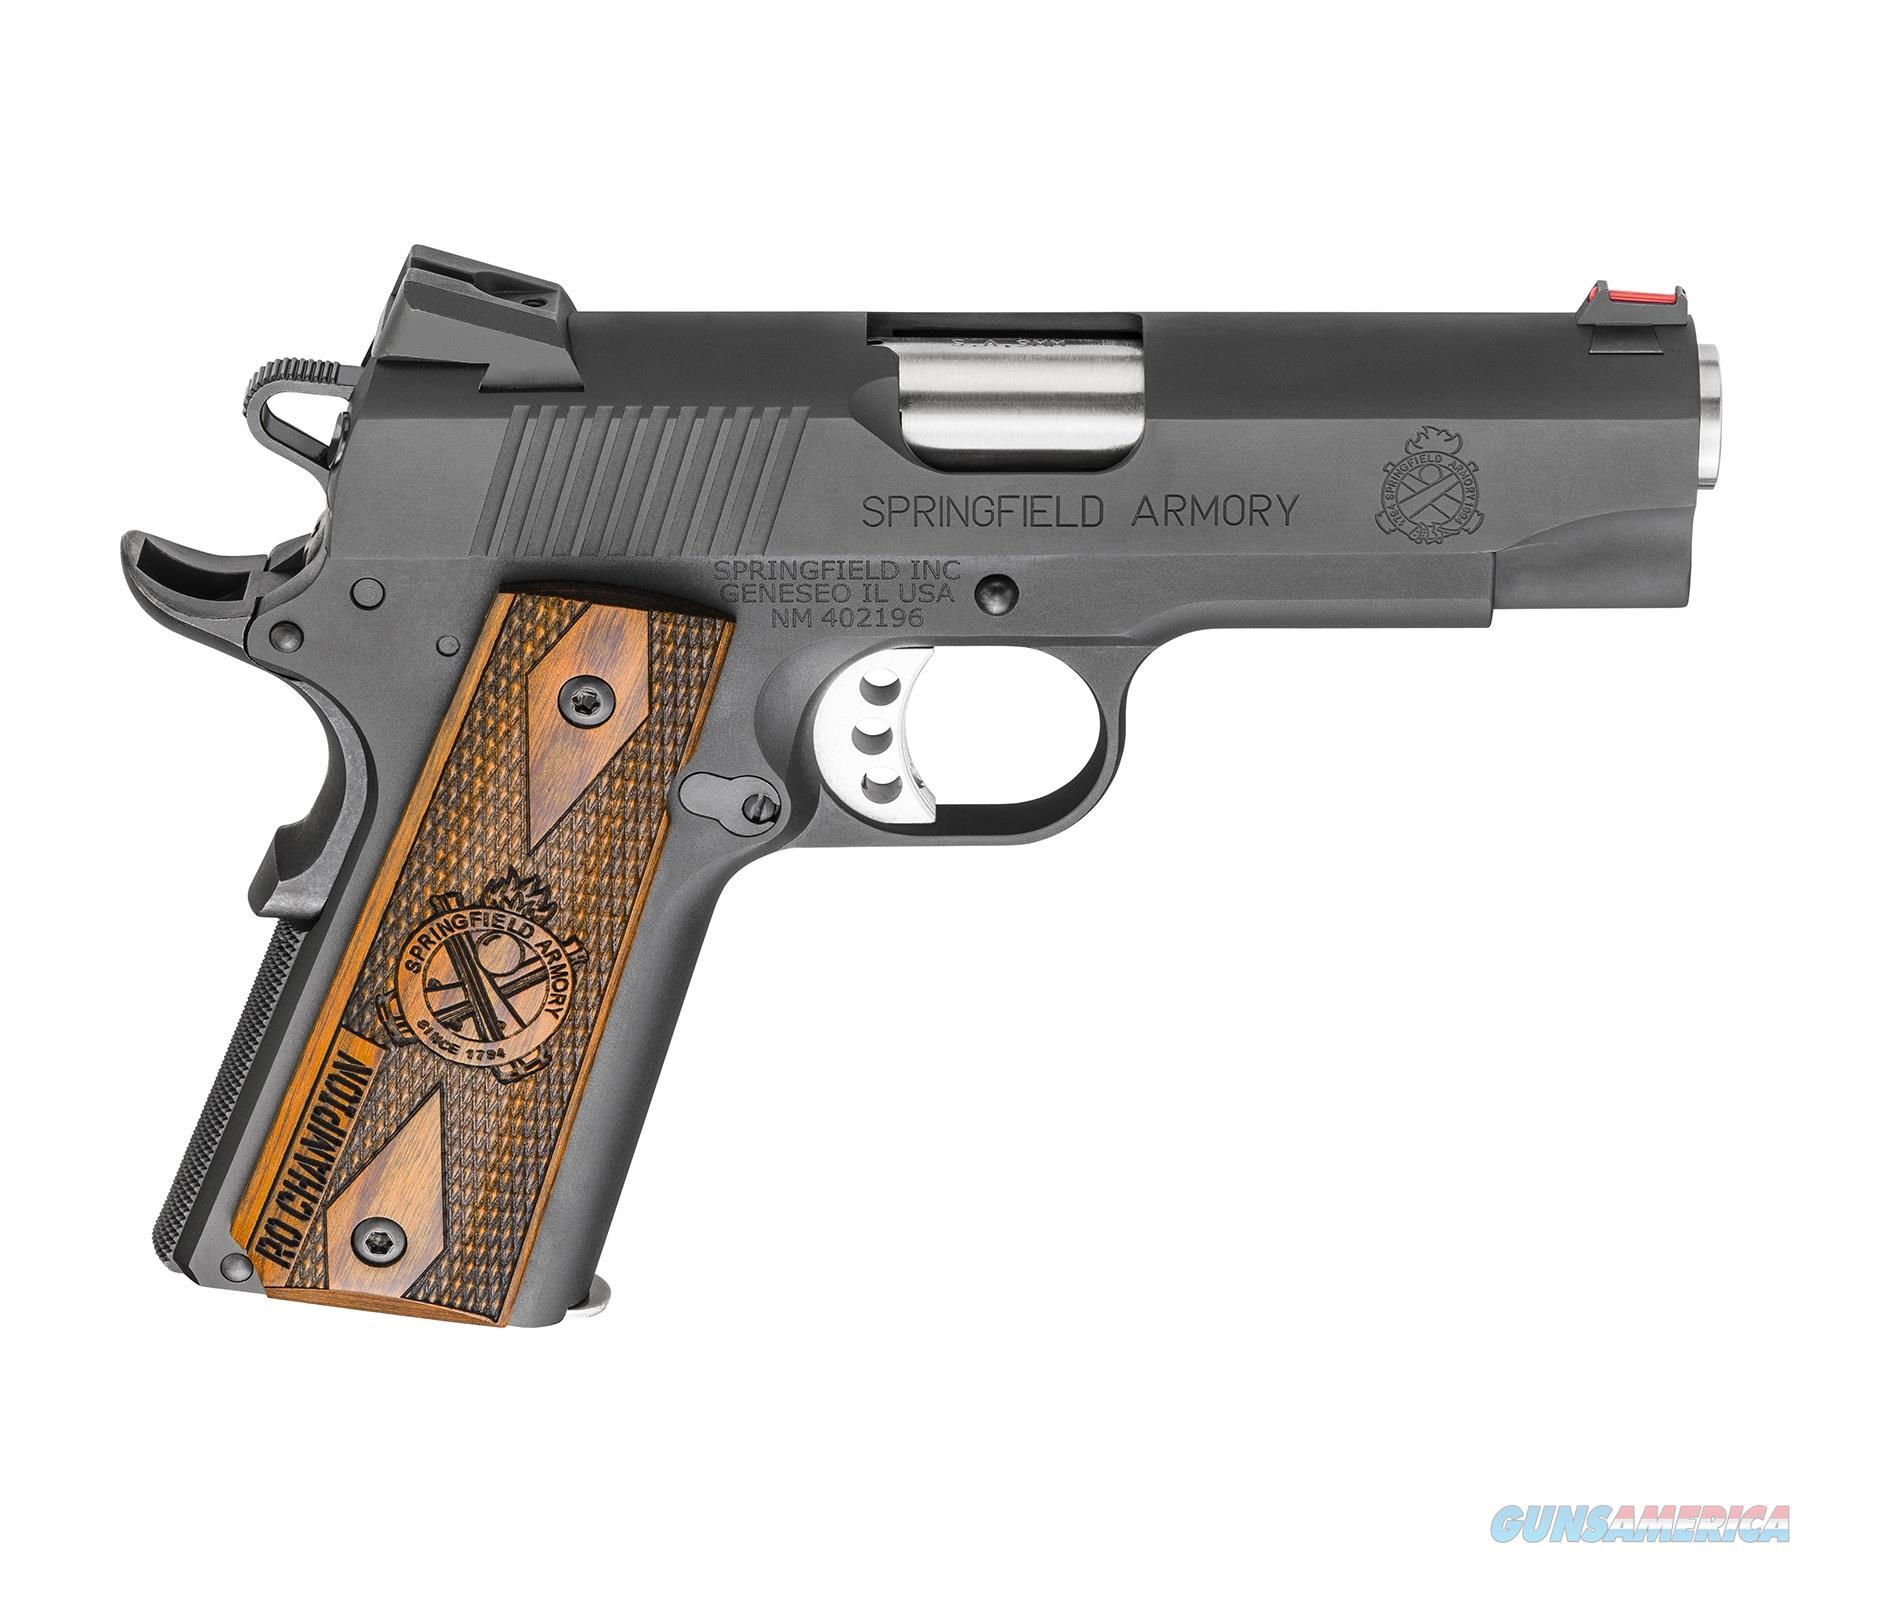 Springfield 1911 Range Officer Champion 9mm PI9137L   Guns > Pistols > Springfield Armory Pistols > 1911 Type